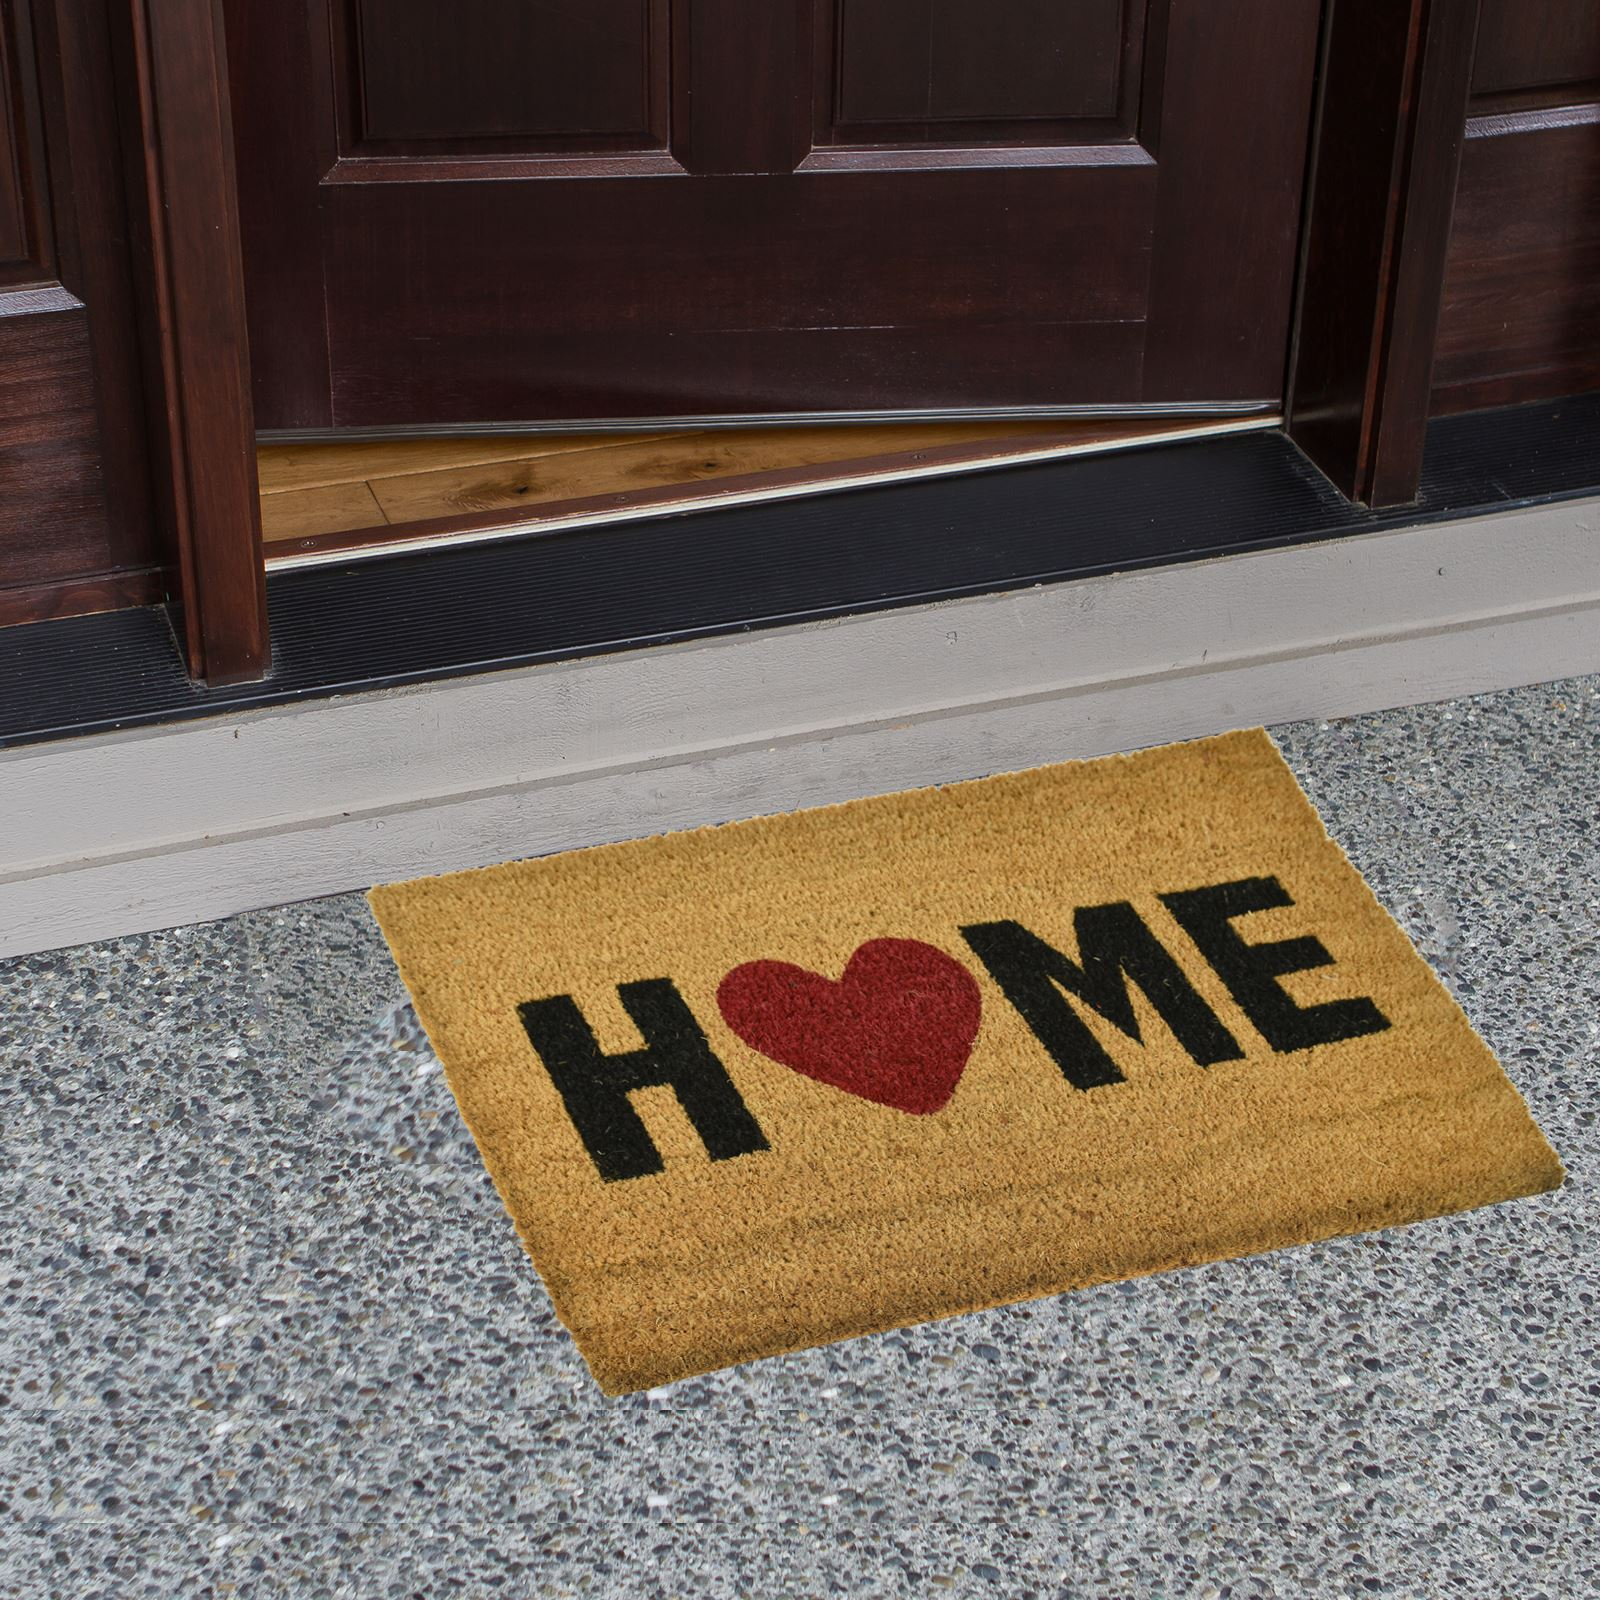 large welcome door entrance mat indoor outdoor non slip. Black Bedroom Furniture Sets. Home Design Ideas